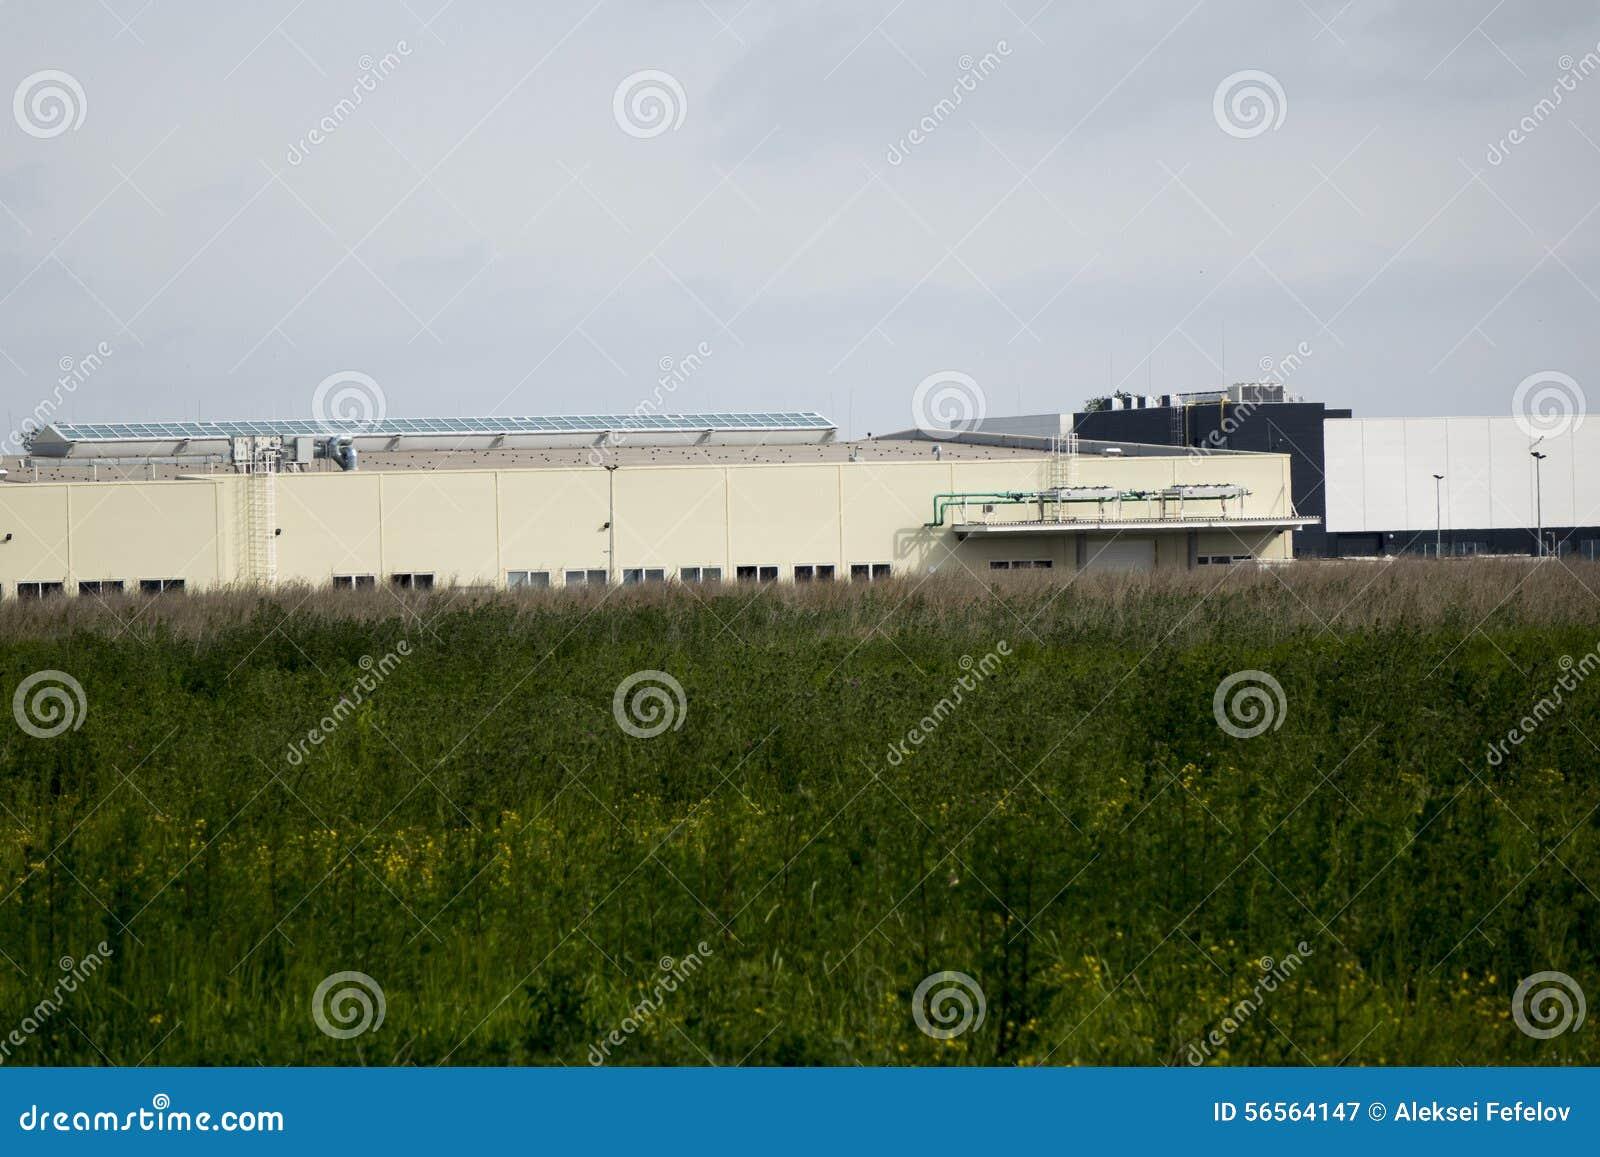 Download τα χρώματα κτηρίων αντιπαραβάλλουν υψηλό βιομηχανικό Στοκ Εικόνα - εικόνα από σκάλες, πύργος: 56564147